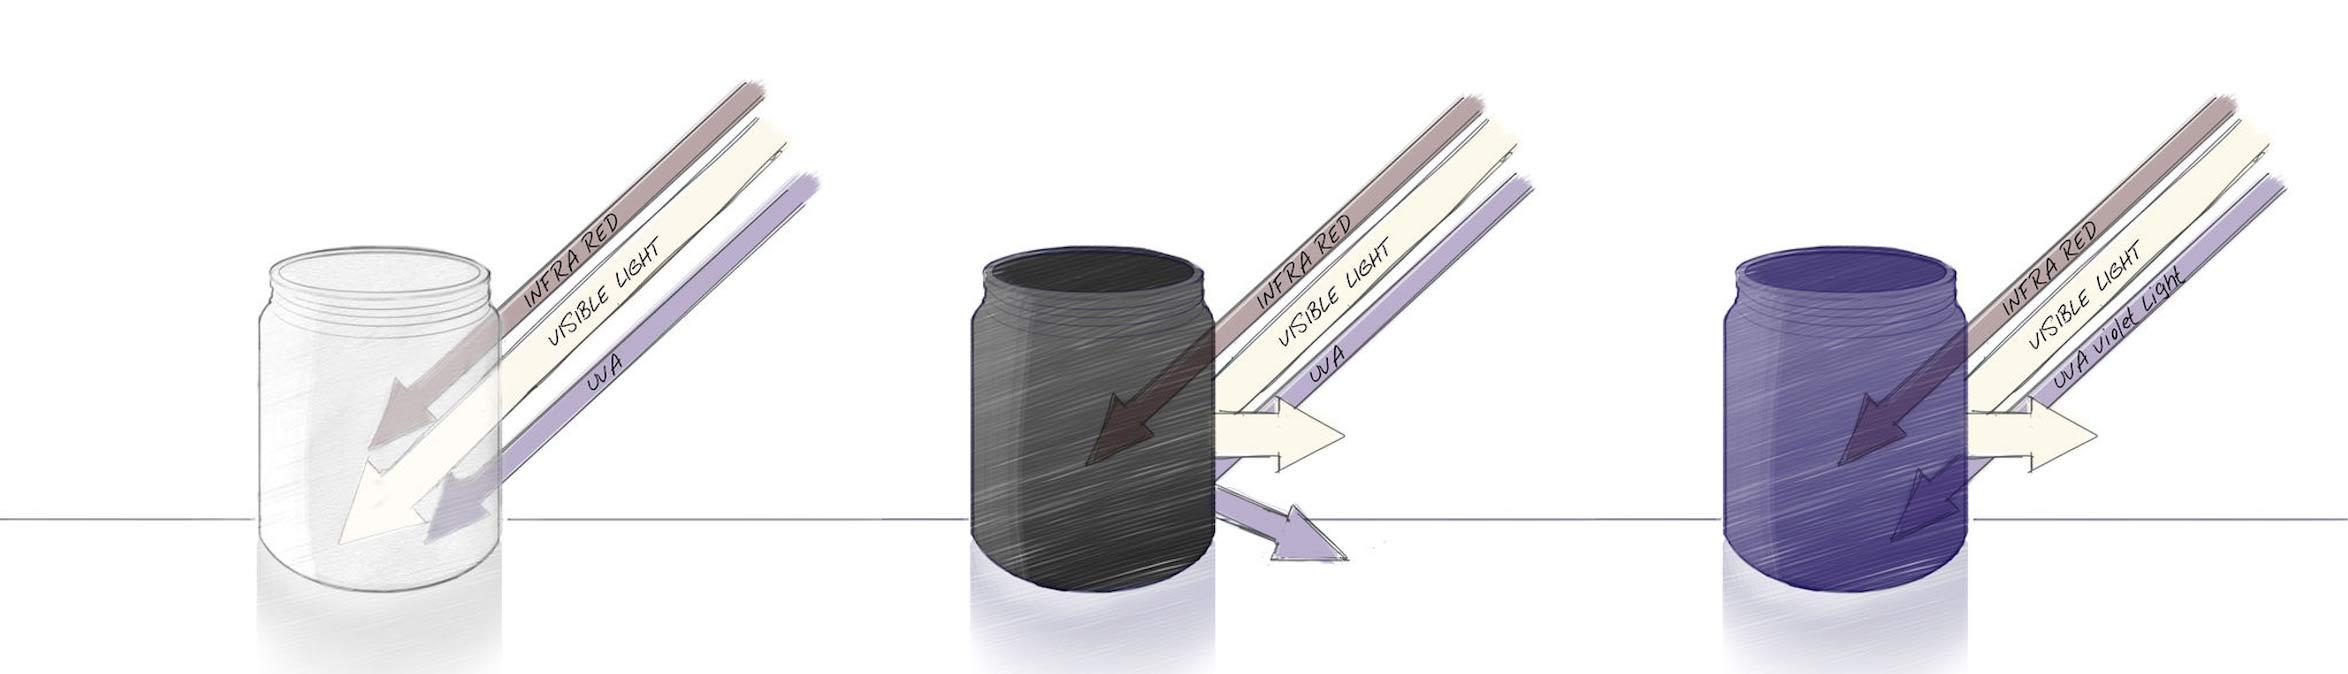 discover-violetglass-light-rays.jpg